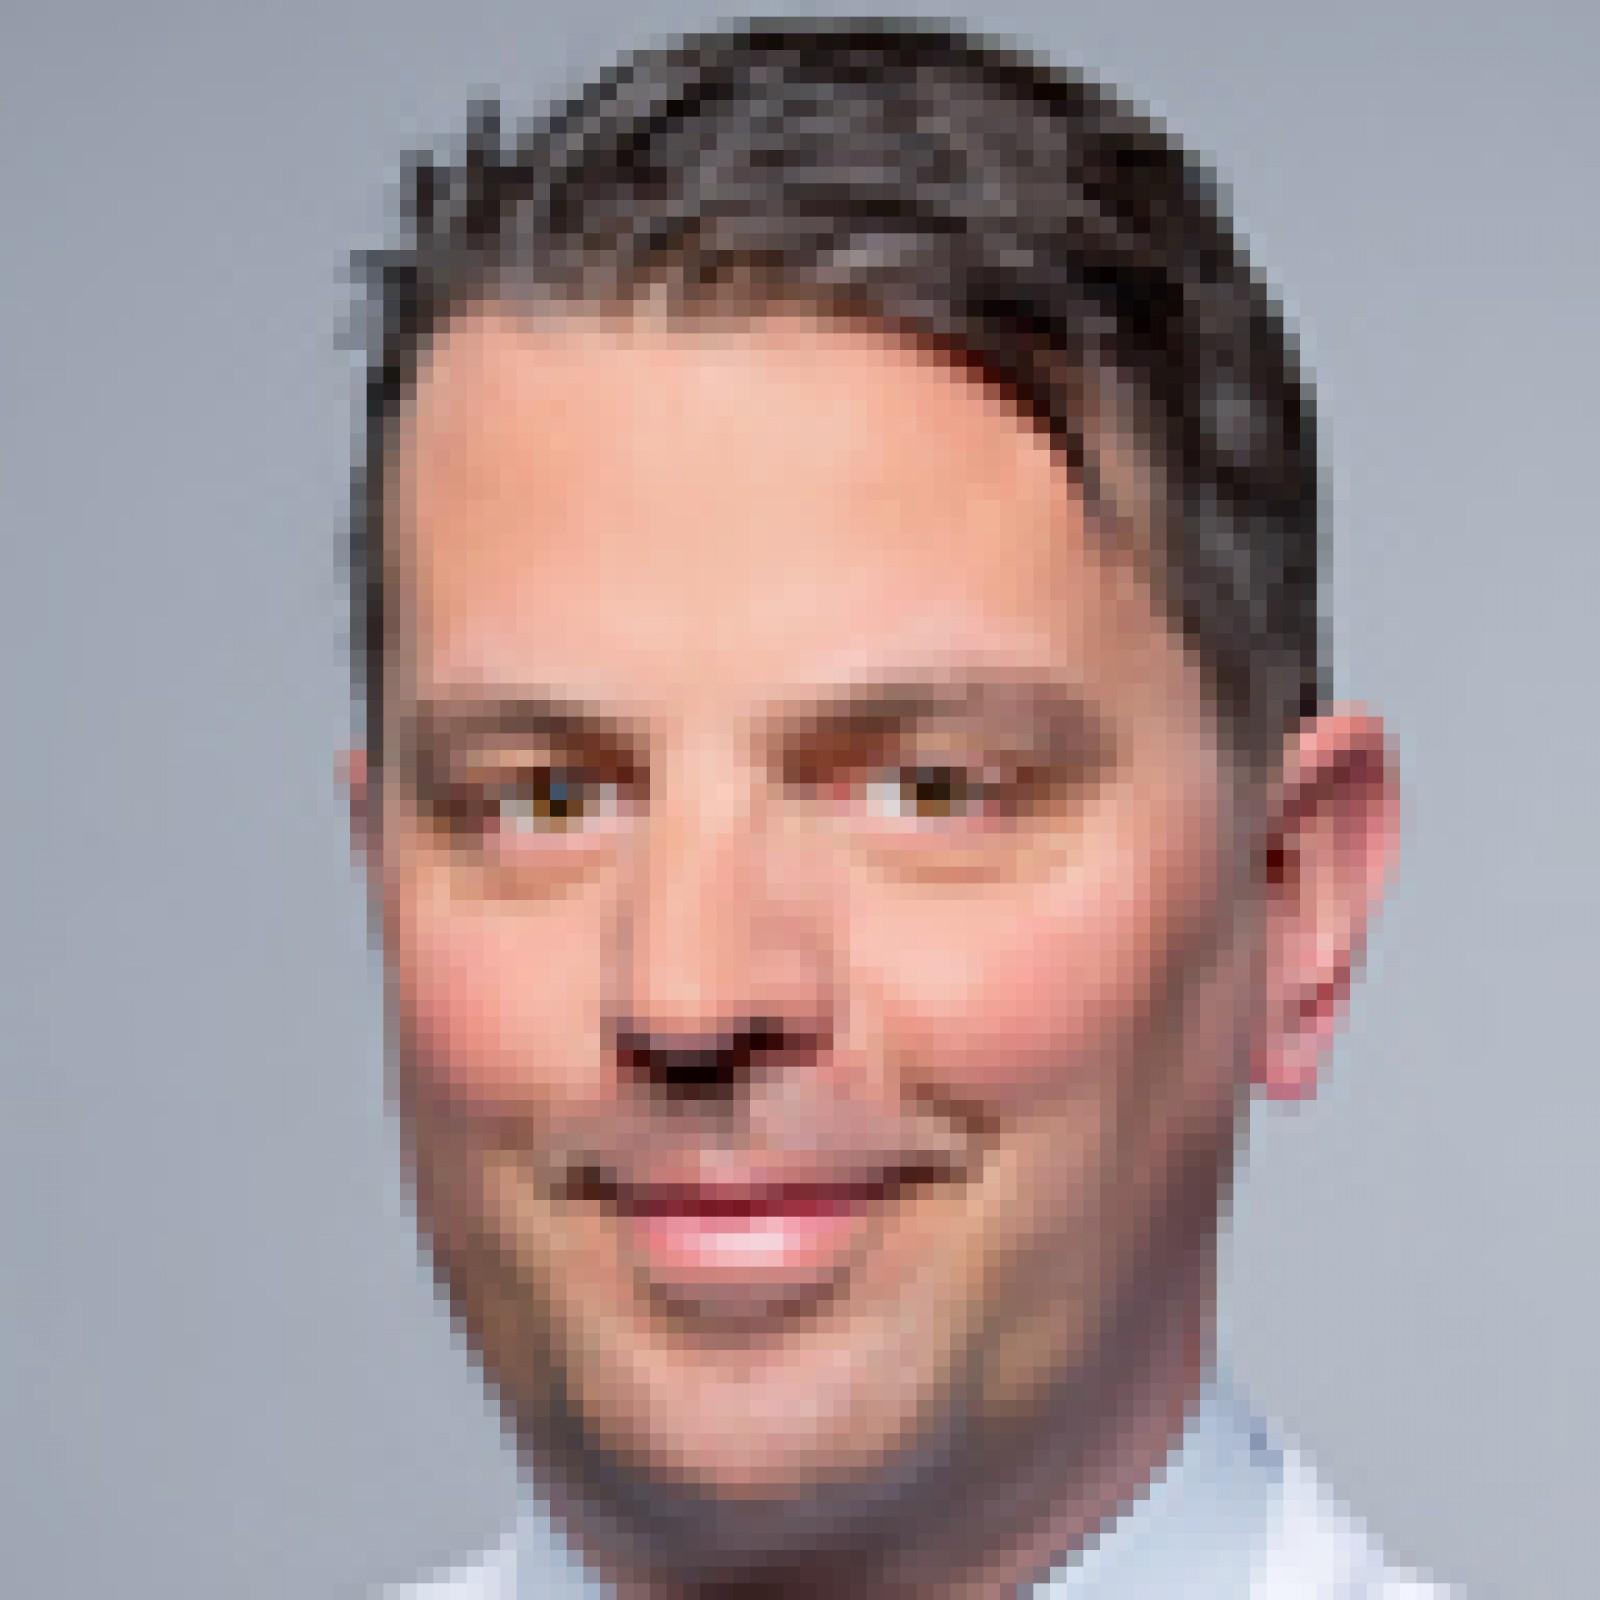 Dr. Stephan Linke